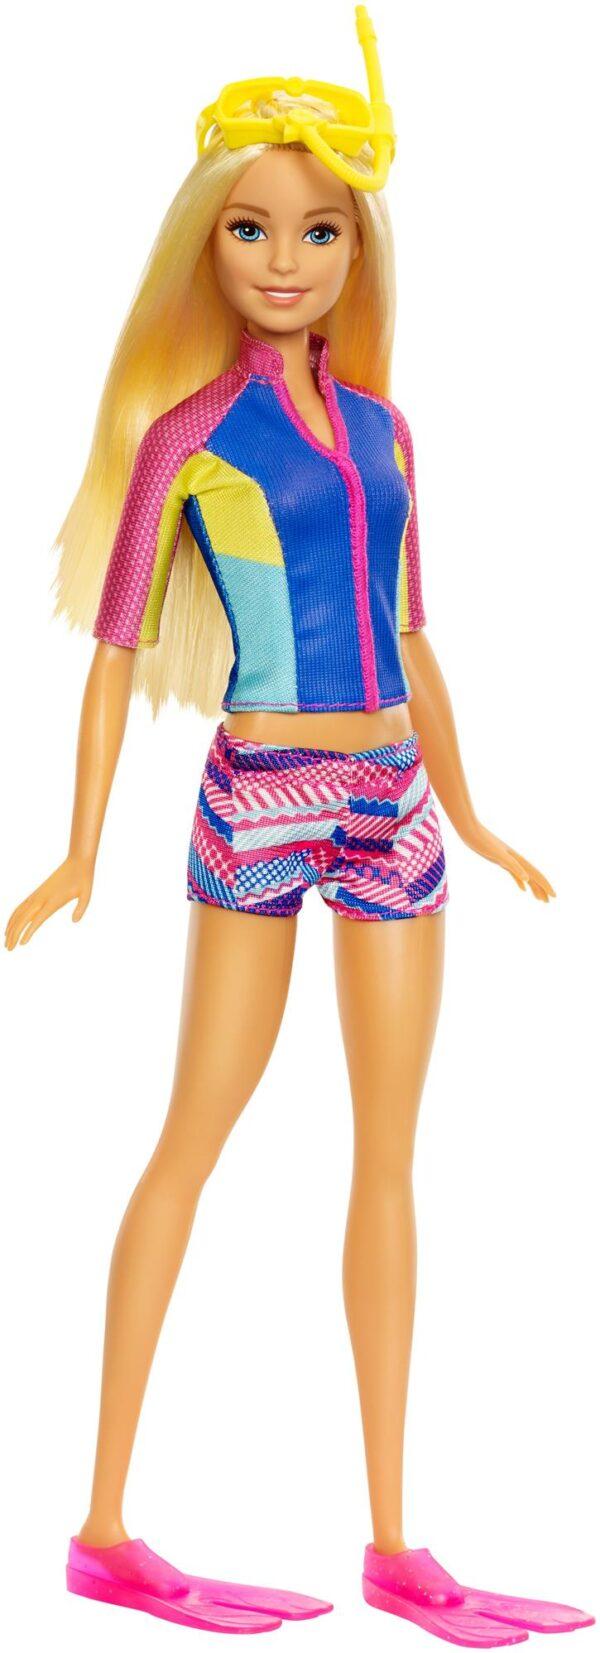 Barbie Magia del Delfino ALTRI Femmina 12-36 Mesi, 12+ Anni, 3-5 Anni, 5-8 Anni, 8-12 Anni Barbie